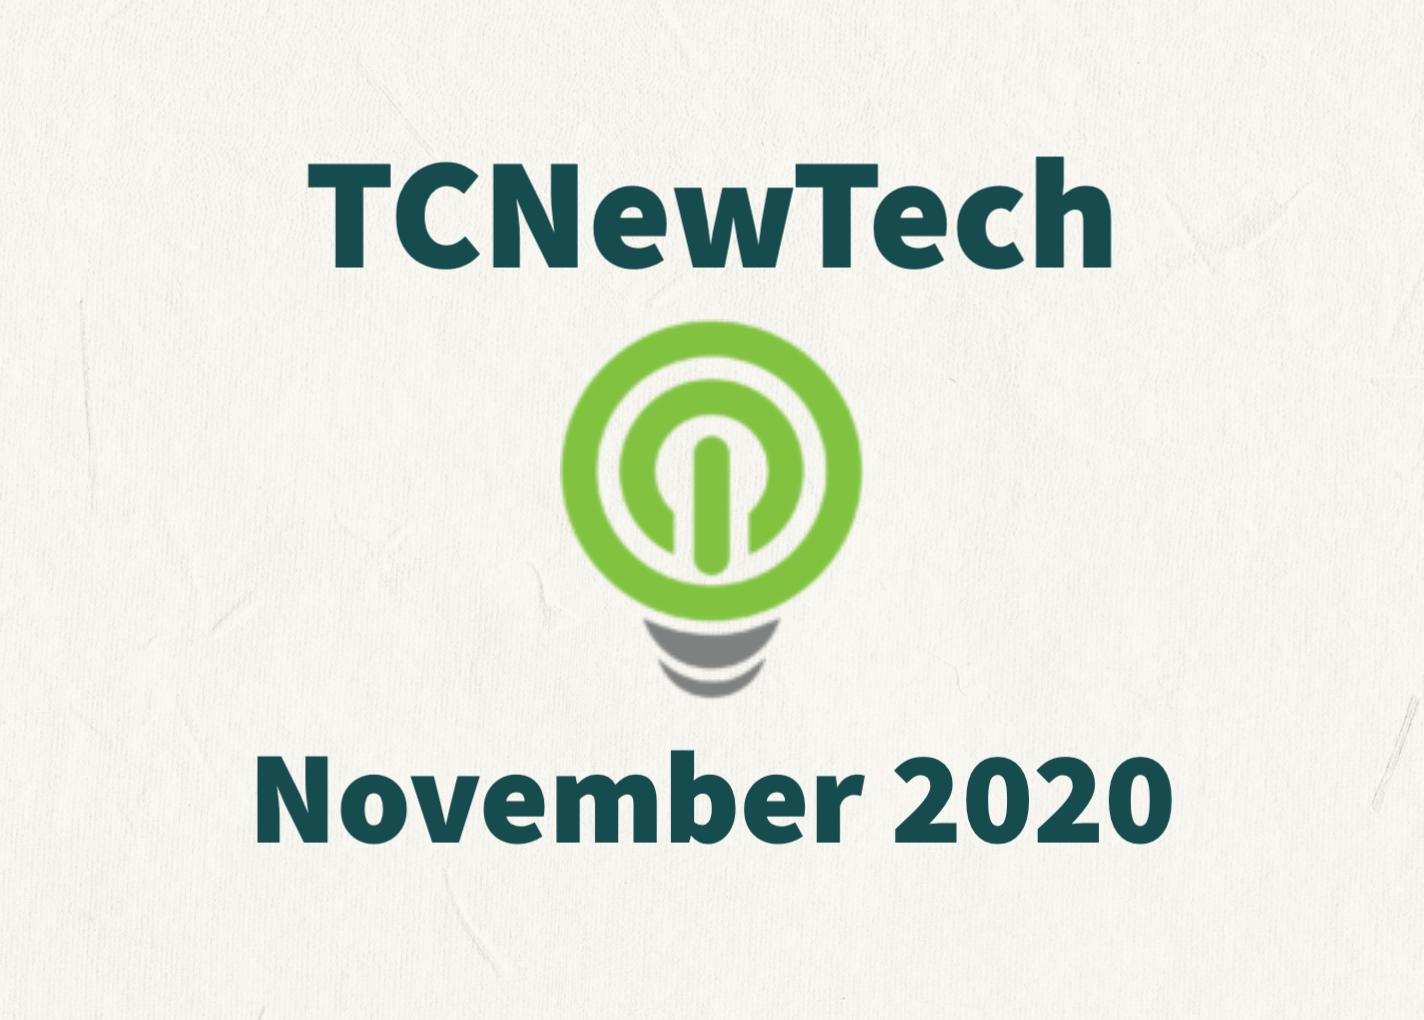 TCNewTech Pitch Contest November 2020